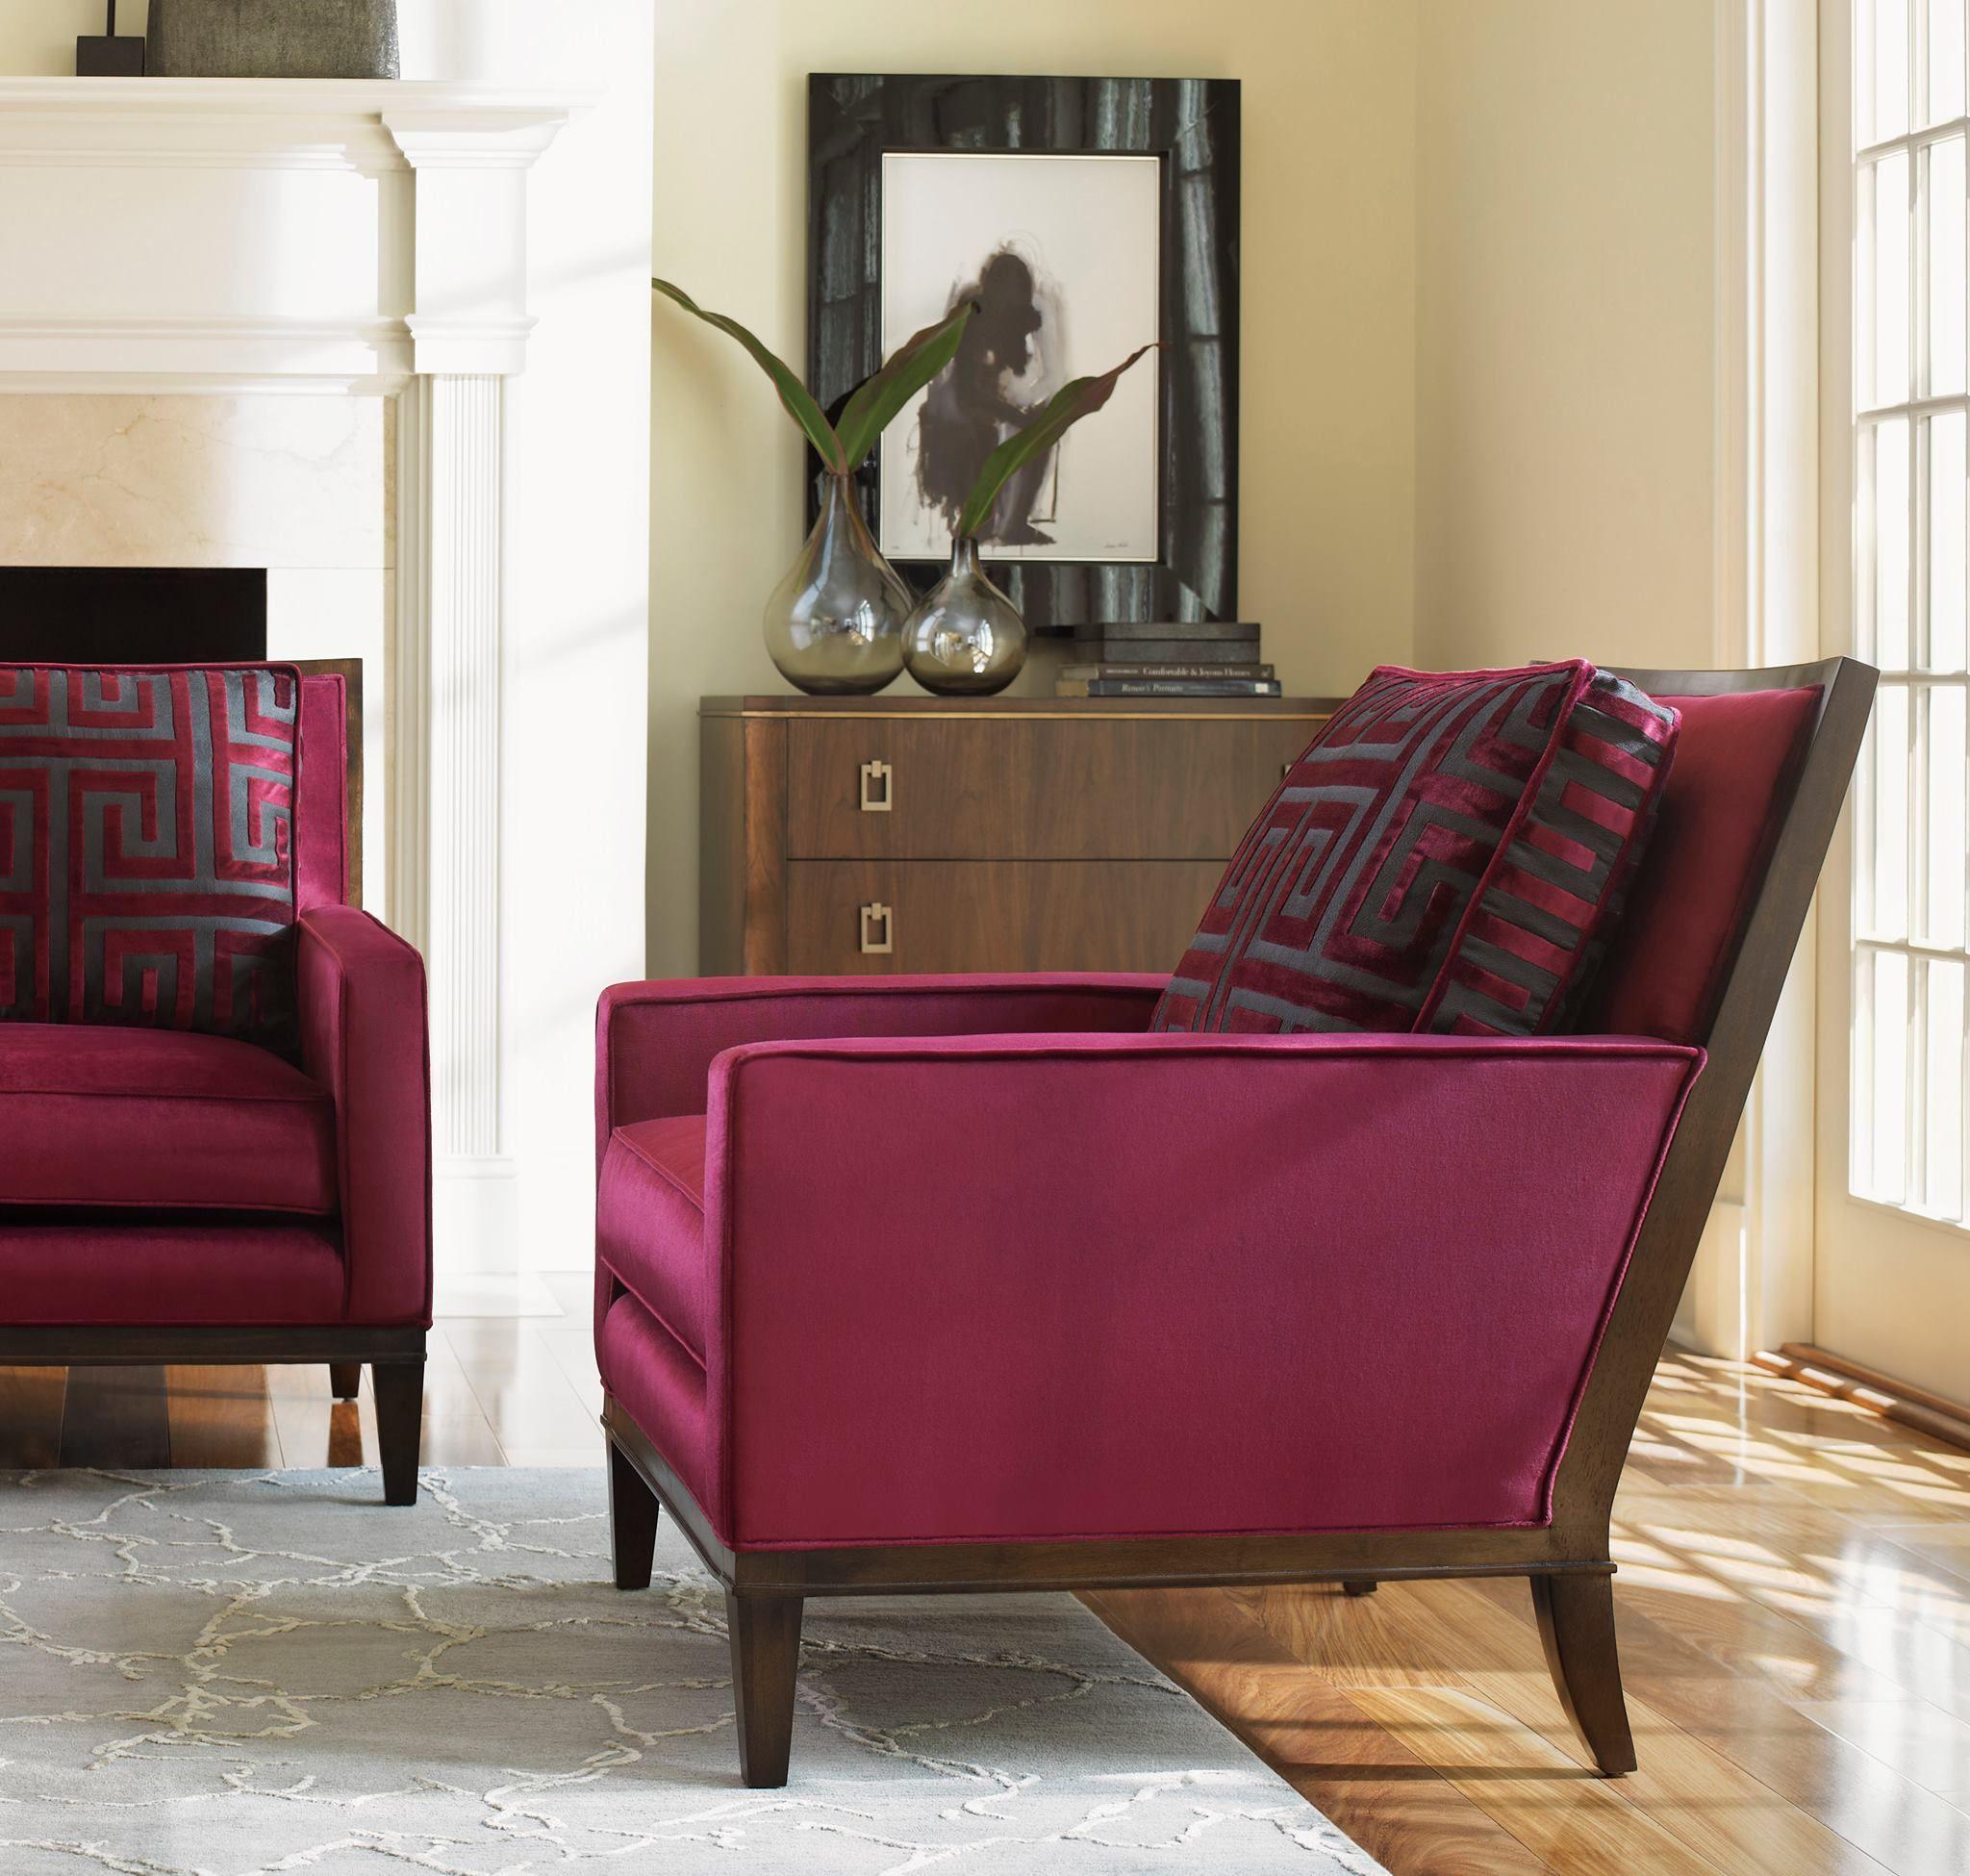 Maryann's Decorating Tip Go bold! Picking a daring hue